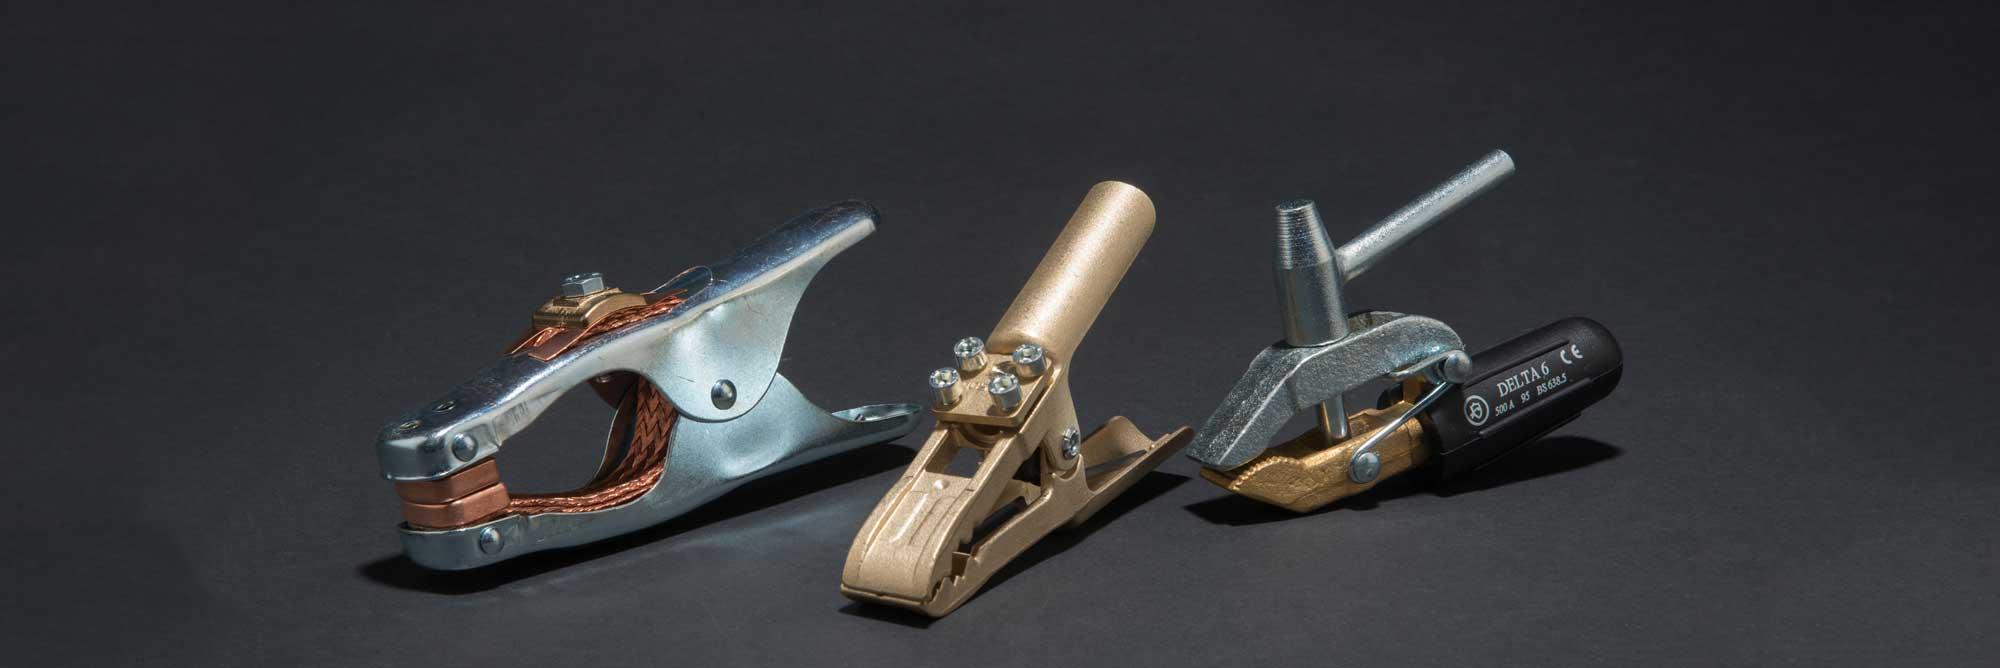 Ground Clamp for Welding - SACIT